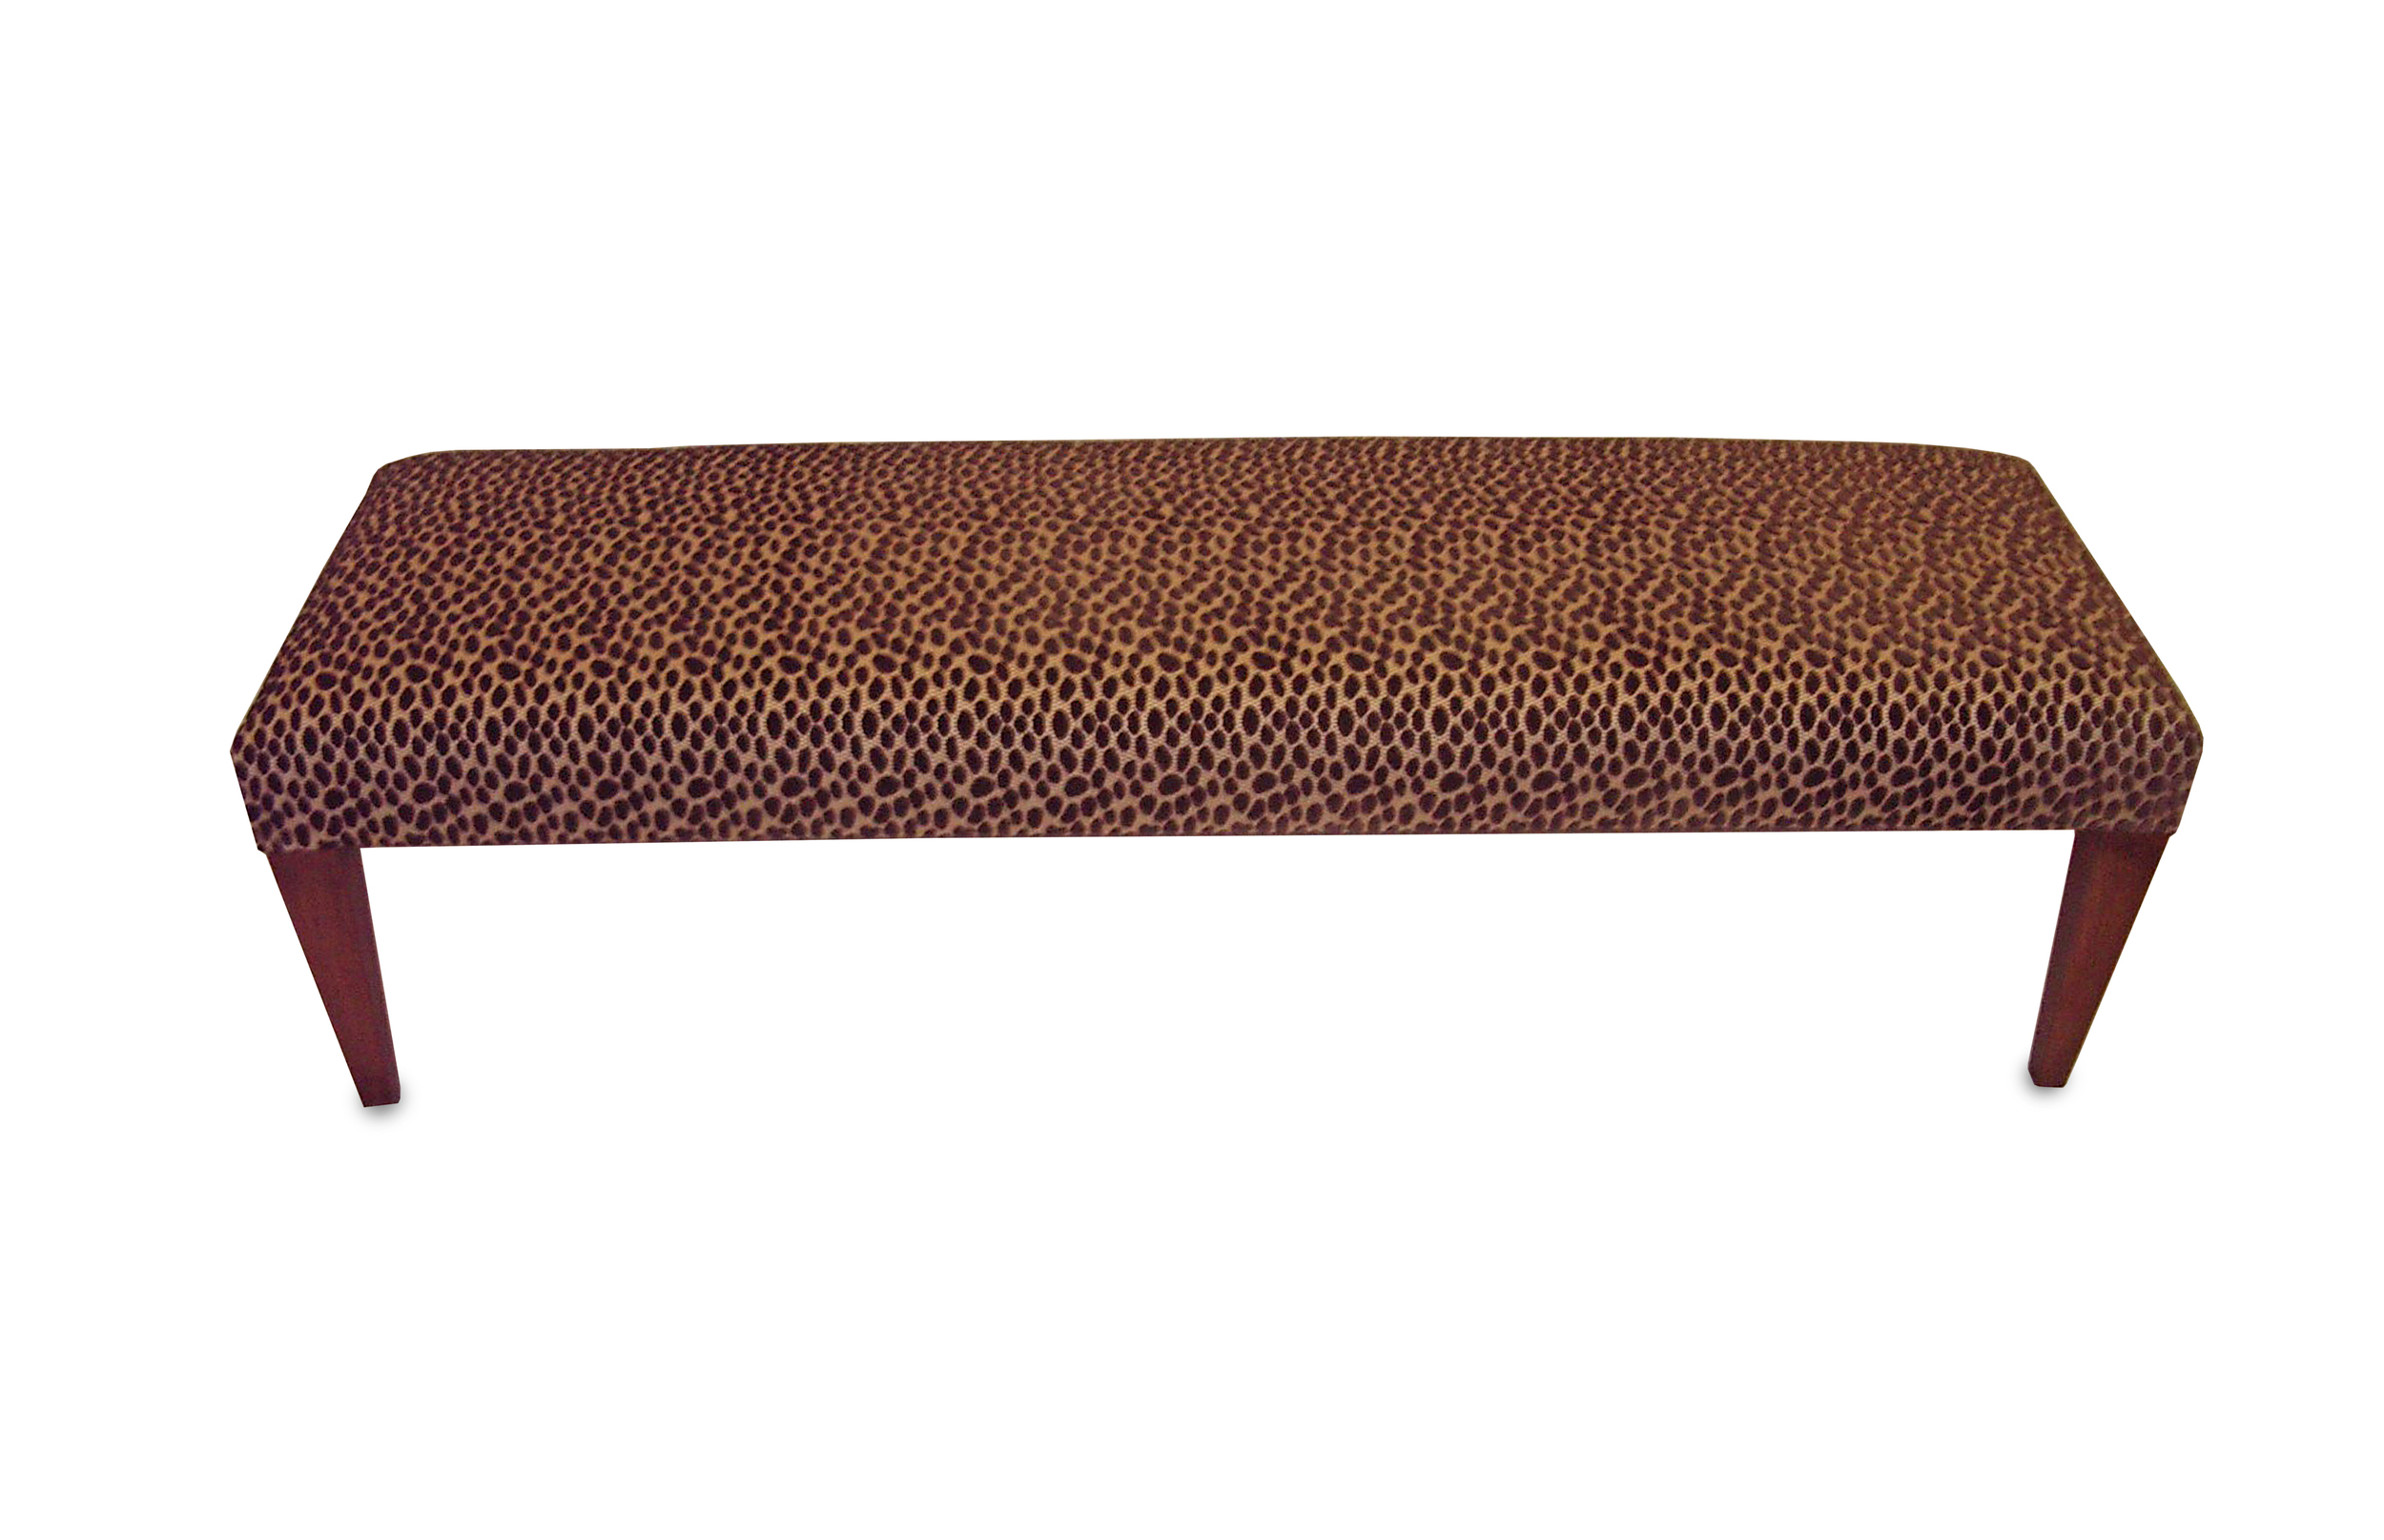 Extra long footstool £625 + fabric